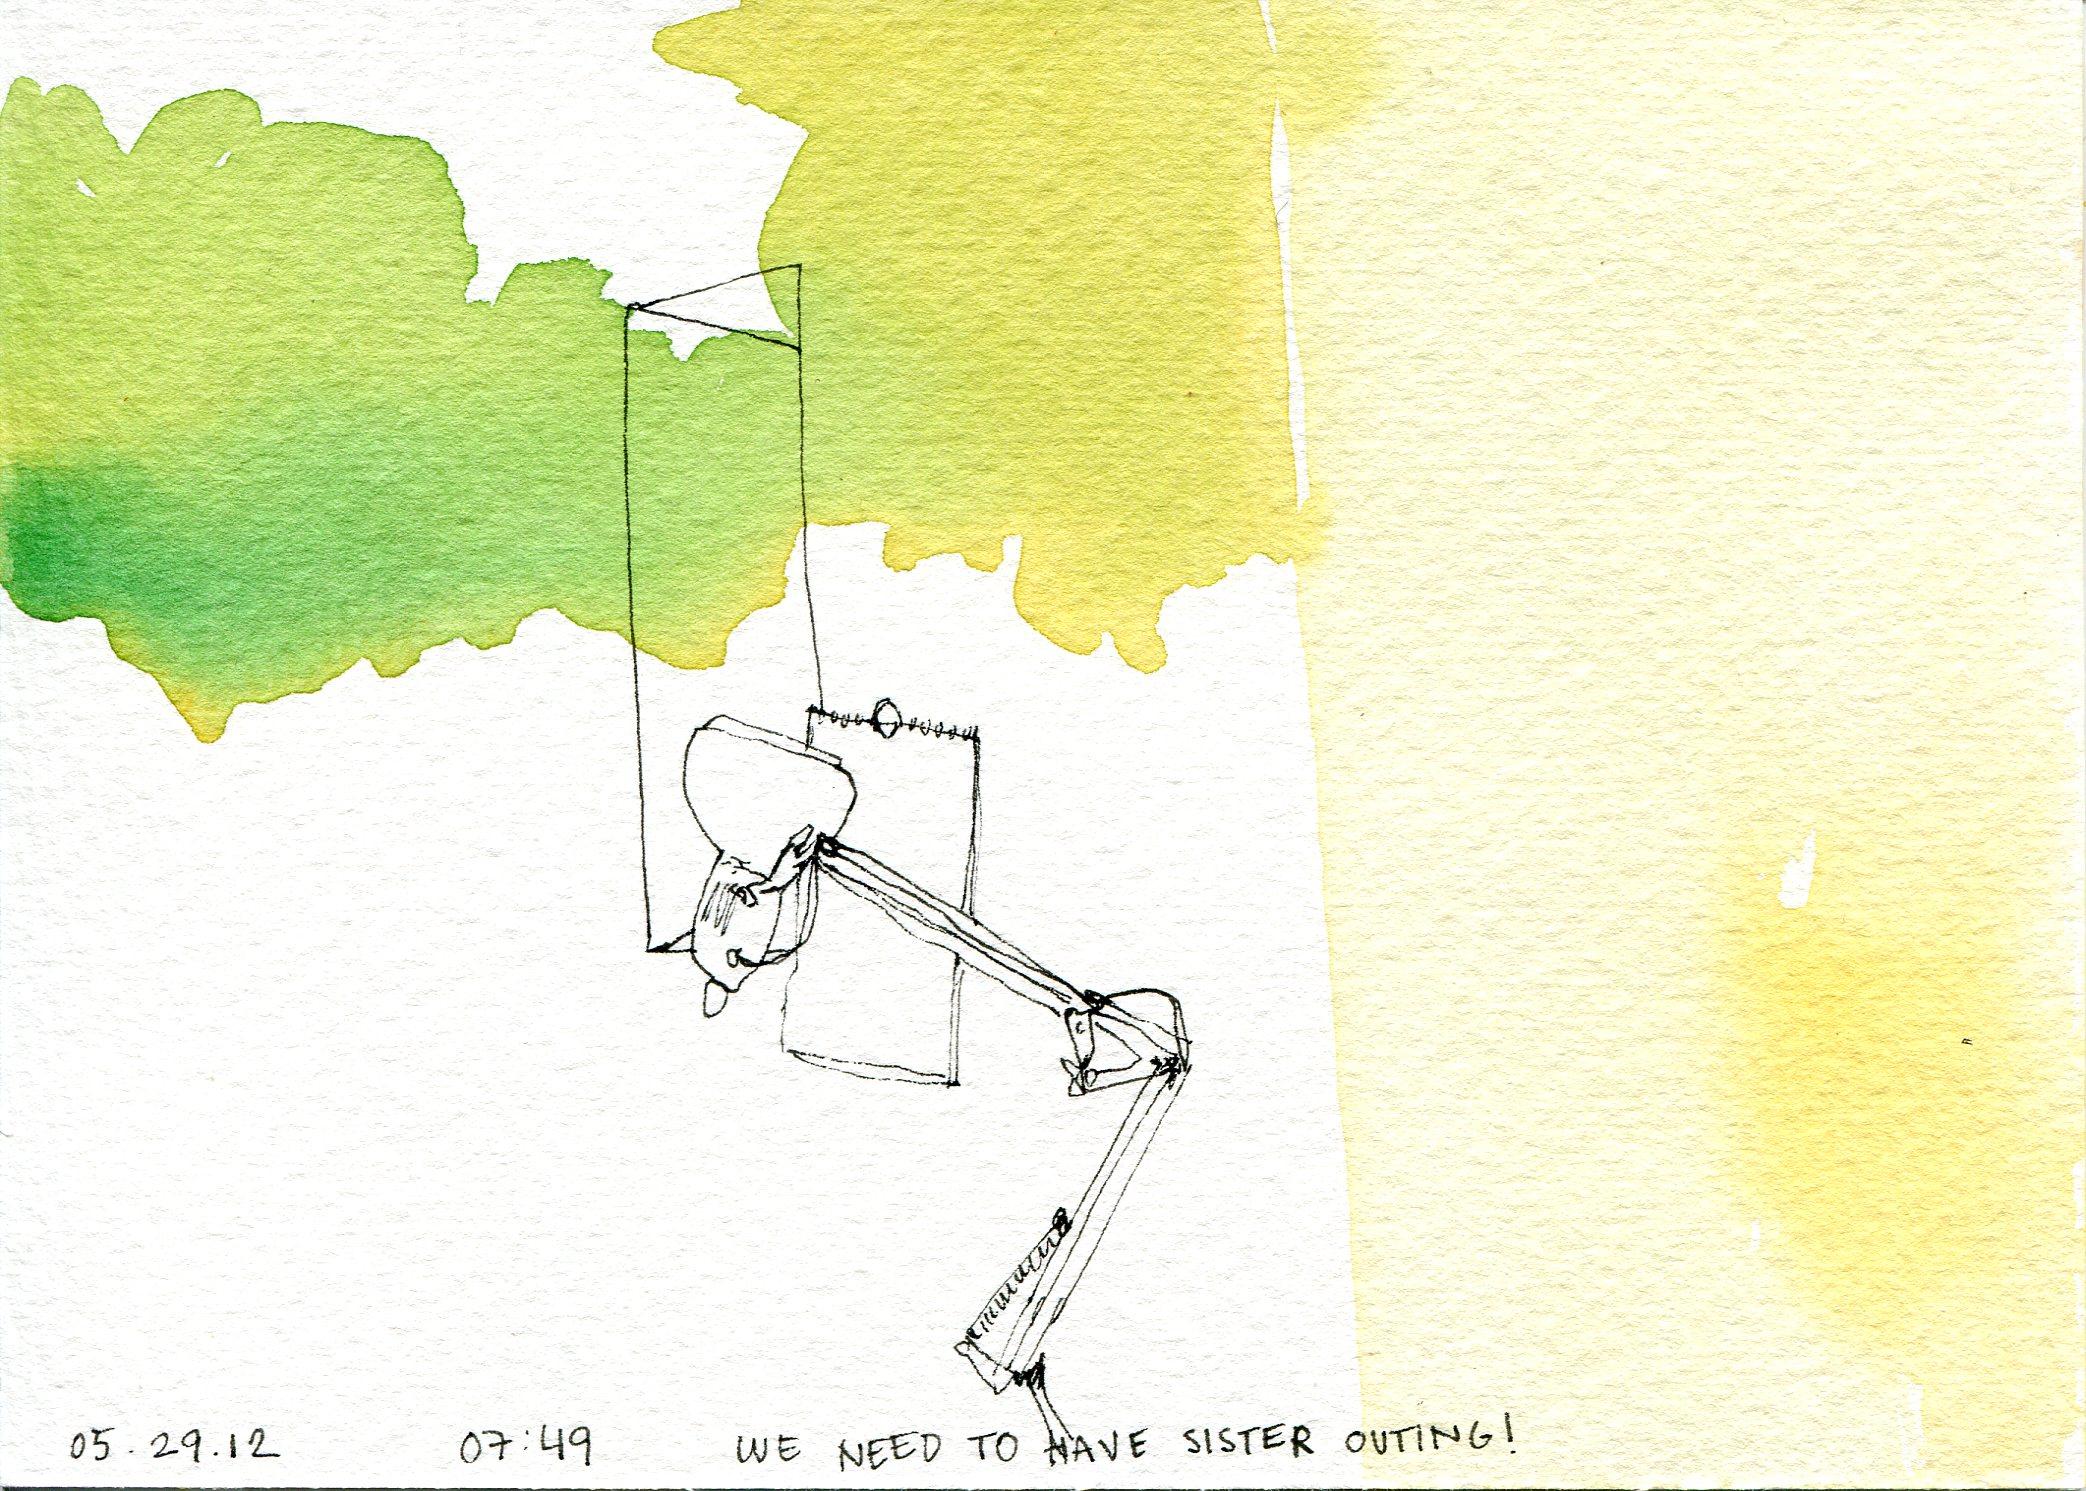 2012-06-02 drawing002.jpg